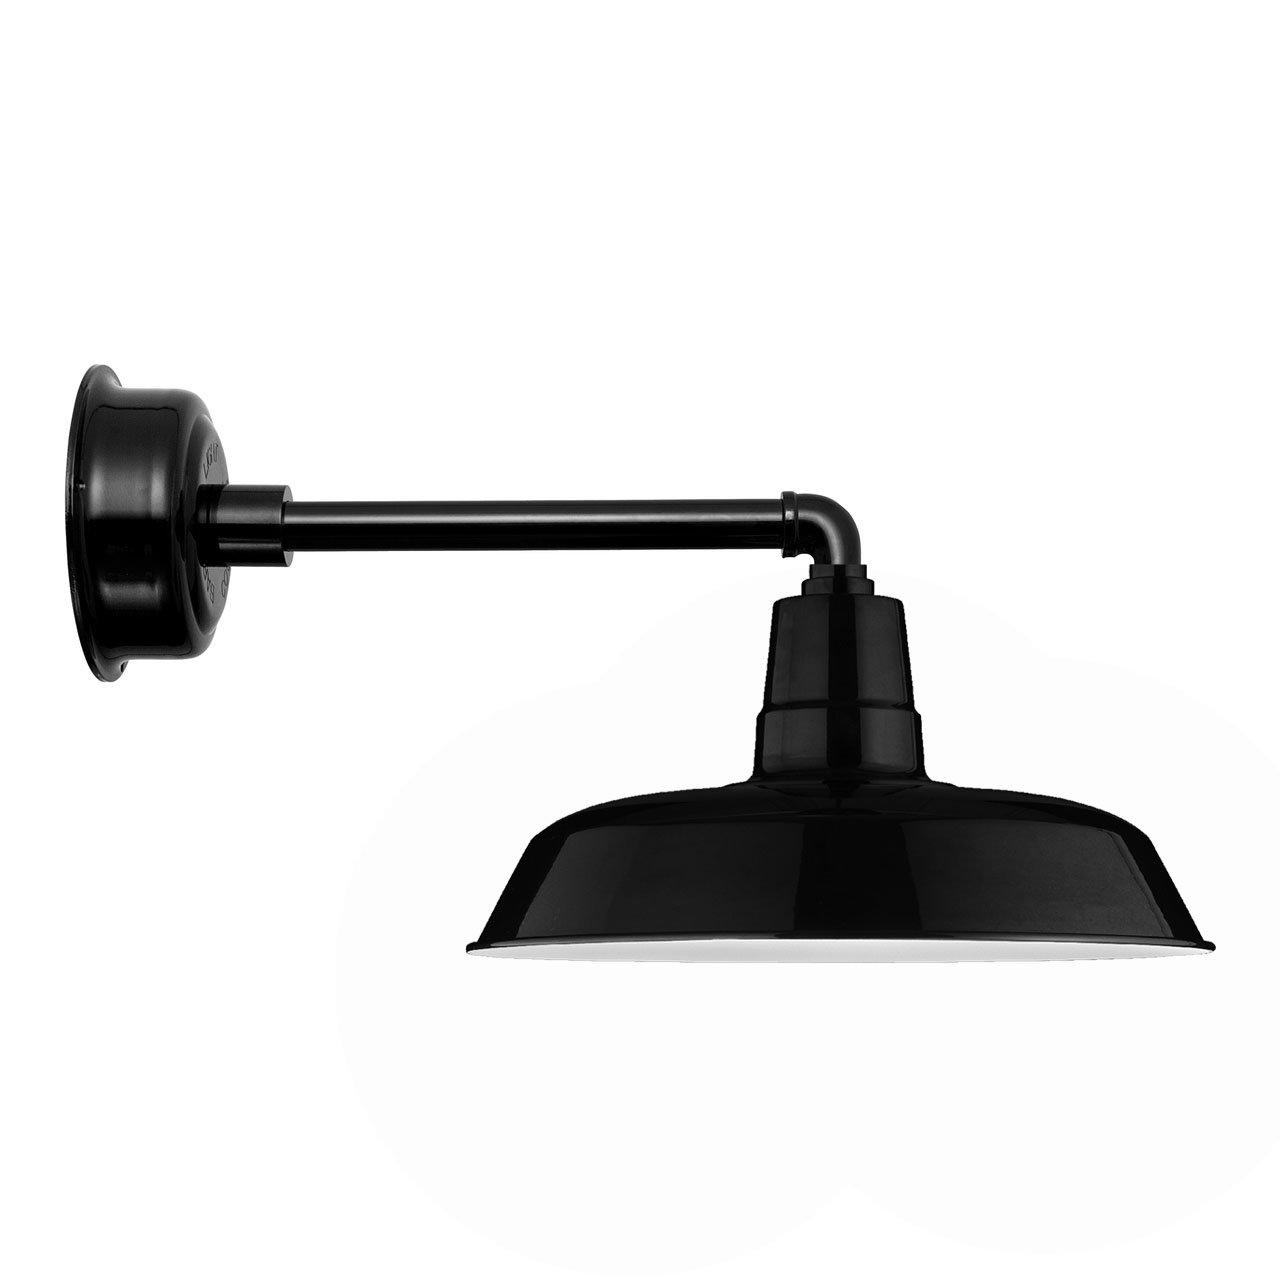 Cocoweb BOAW14BK-1B Oldage LED Barn Light With Metropolitan Stem, 14'', Black